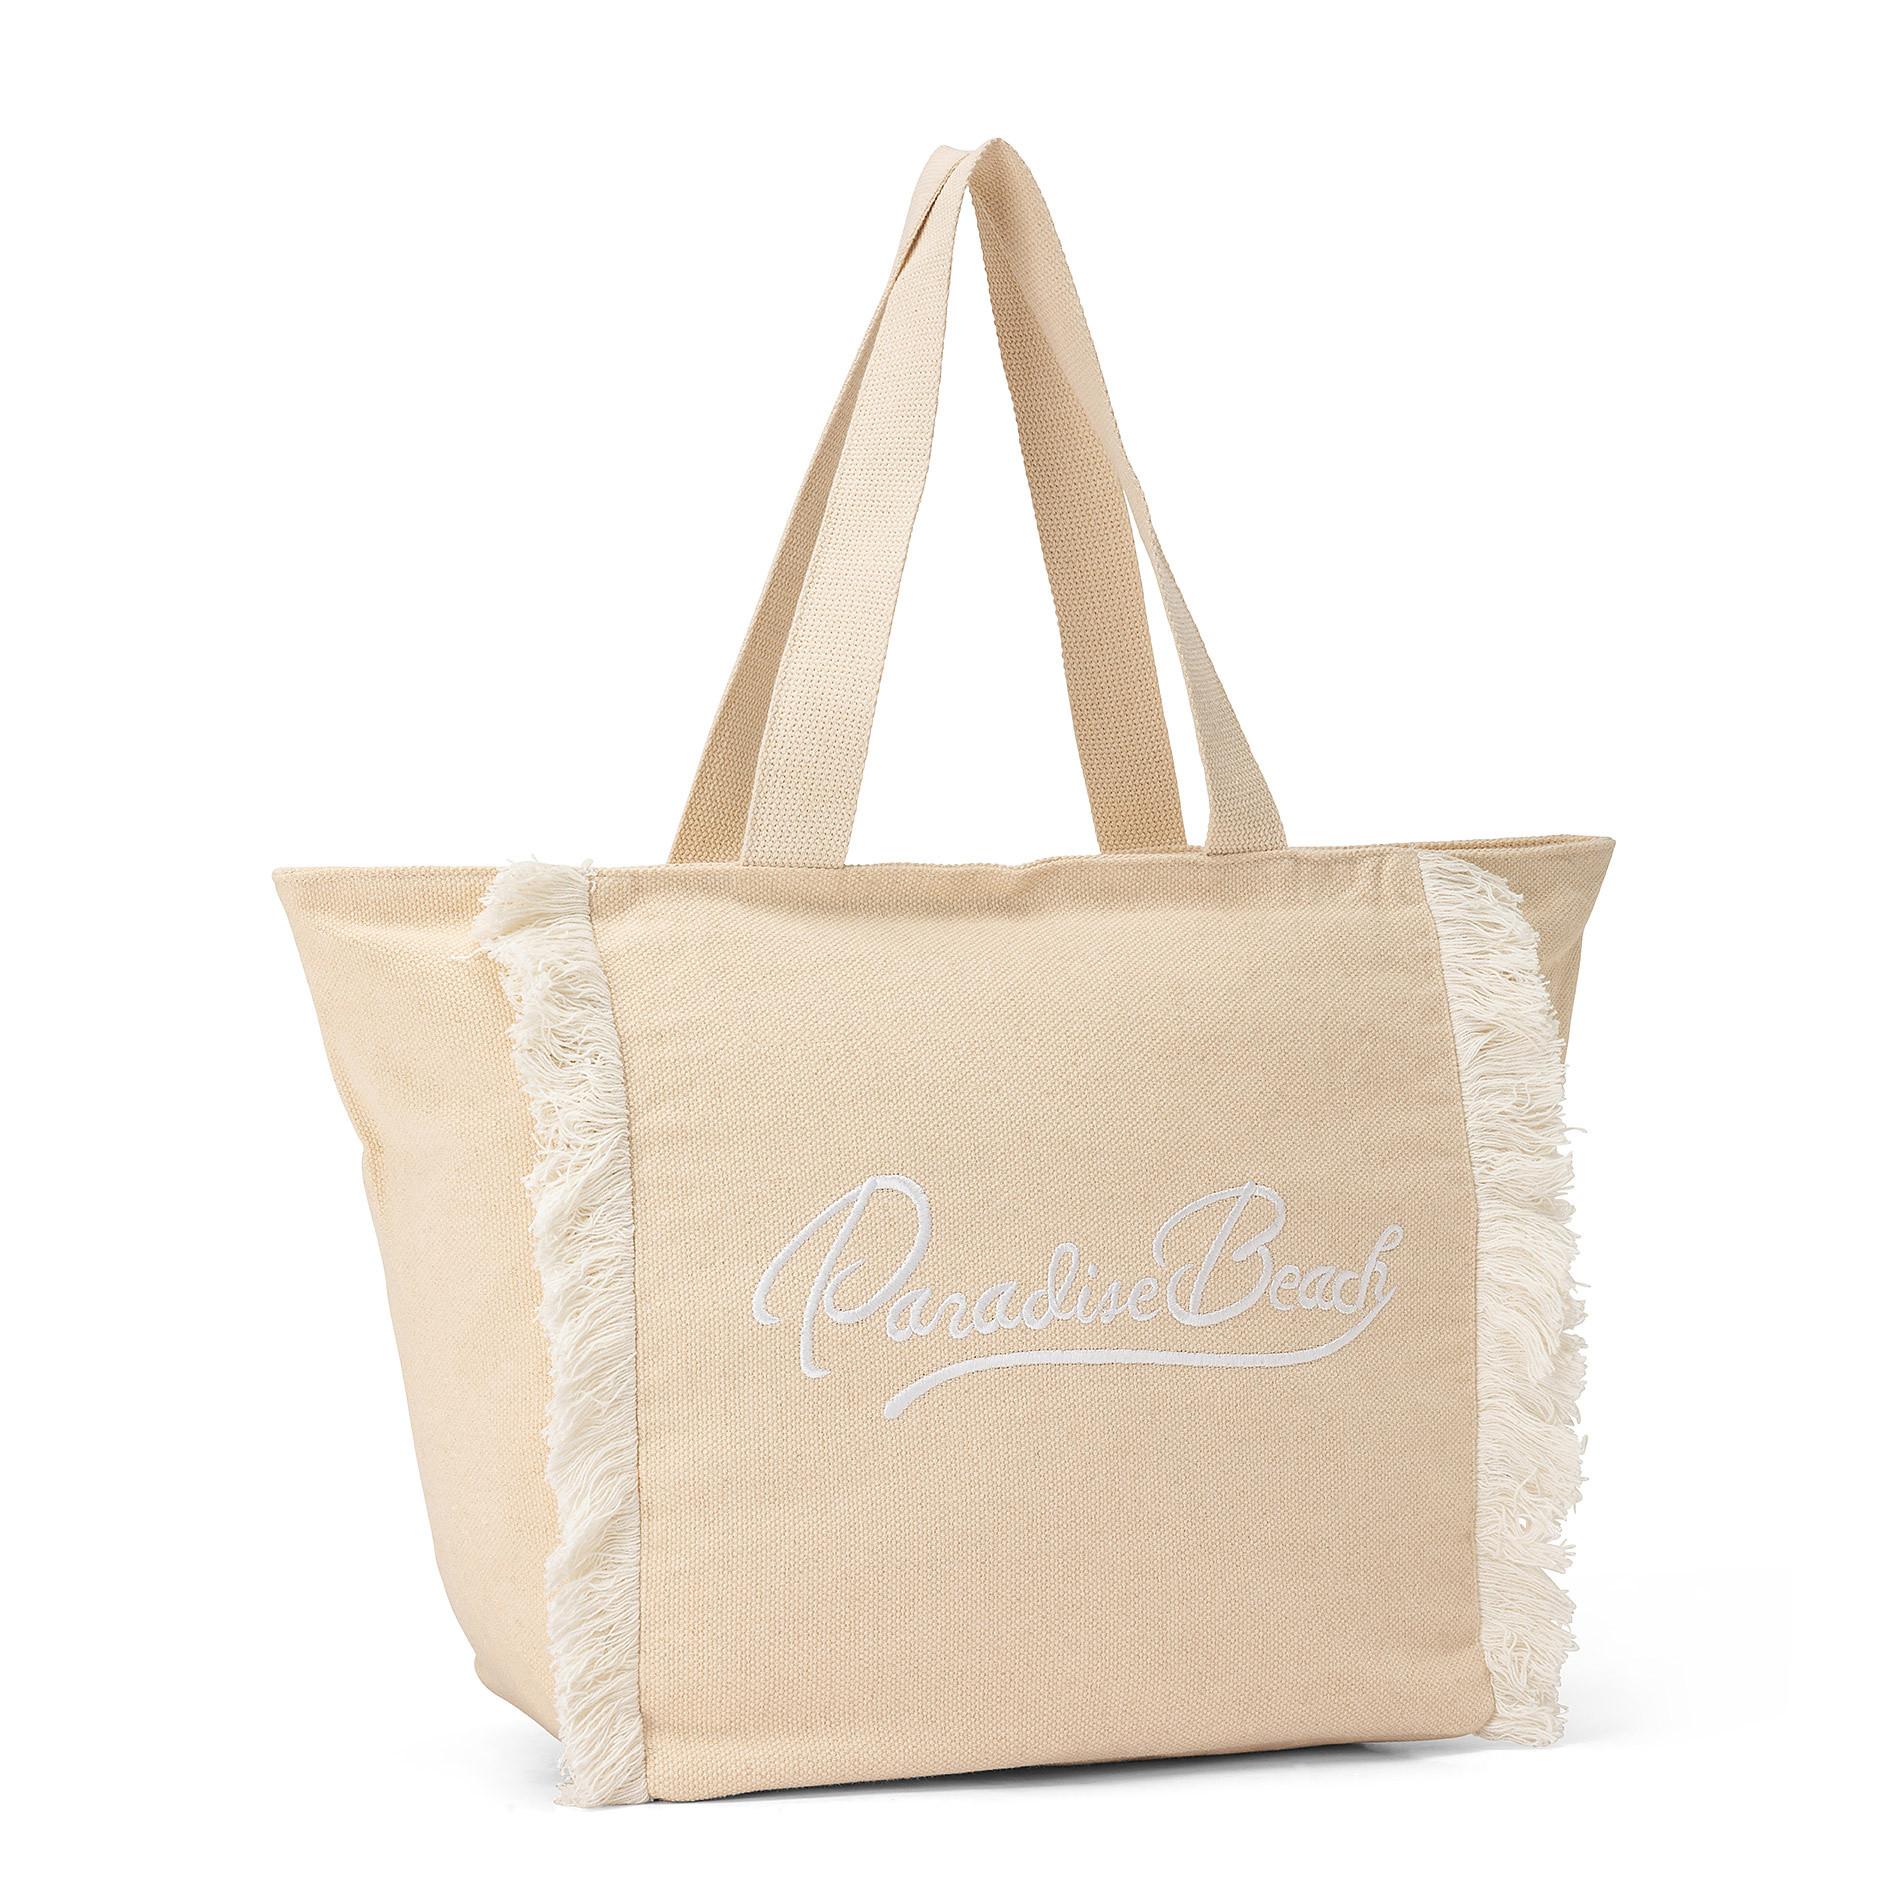 Shopper in canvas di cotone con ricamo, Beige, large image number 2